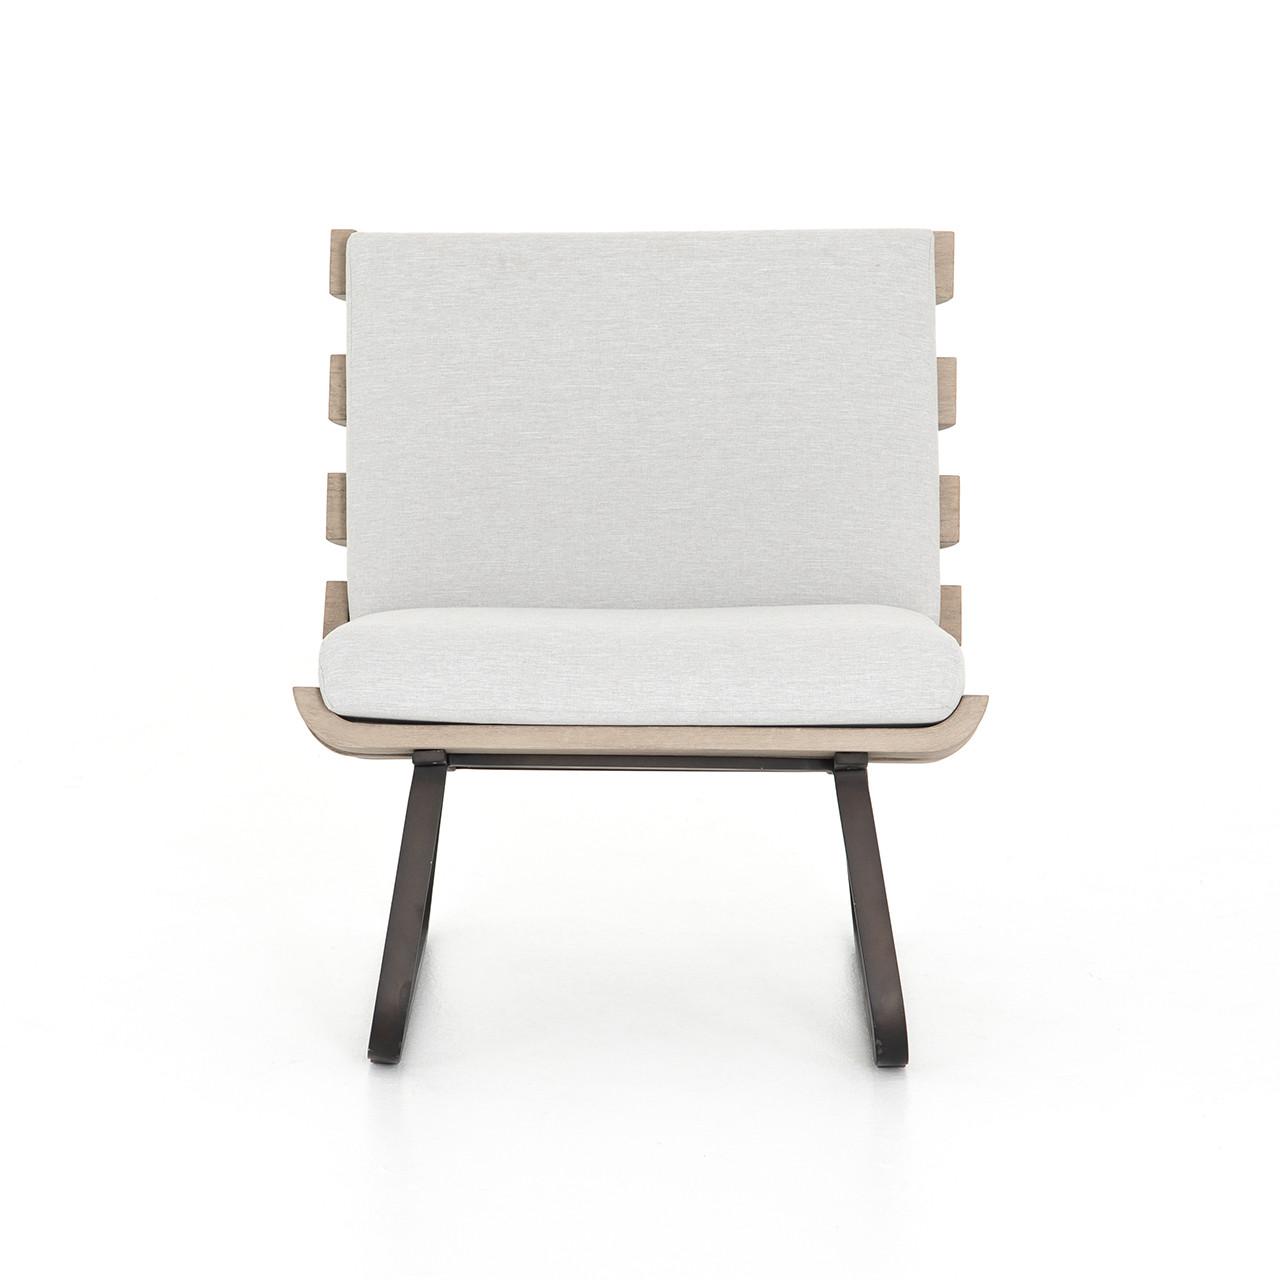 Dimitri Outdoor Chair - Stone Grey